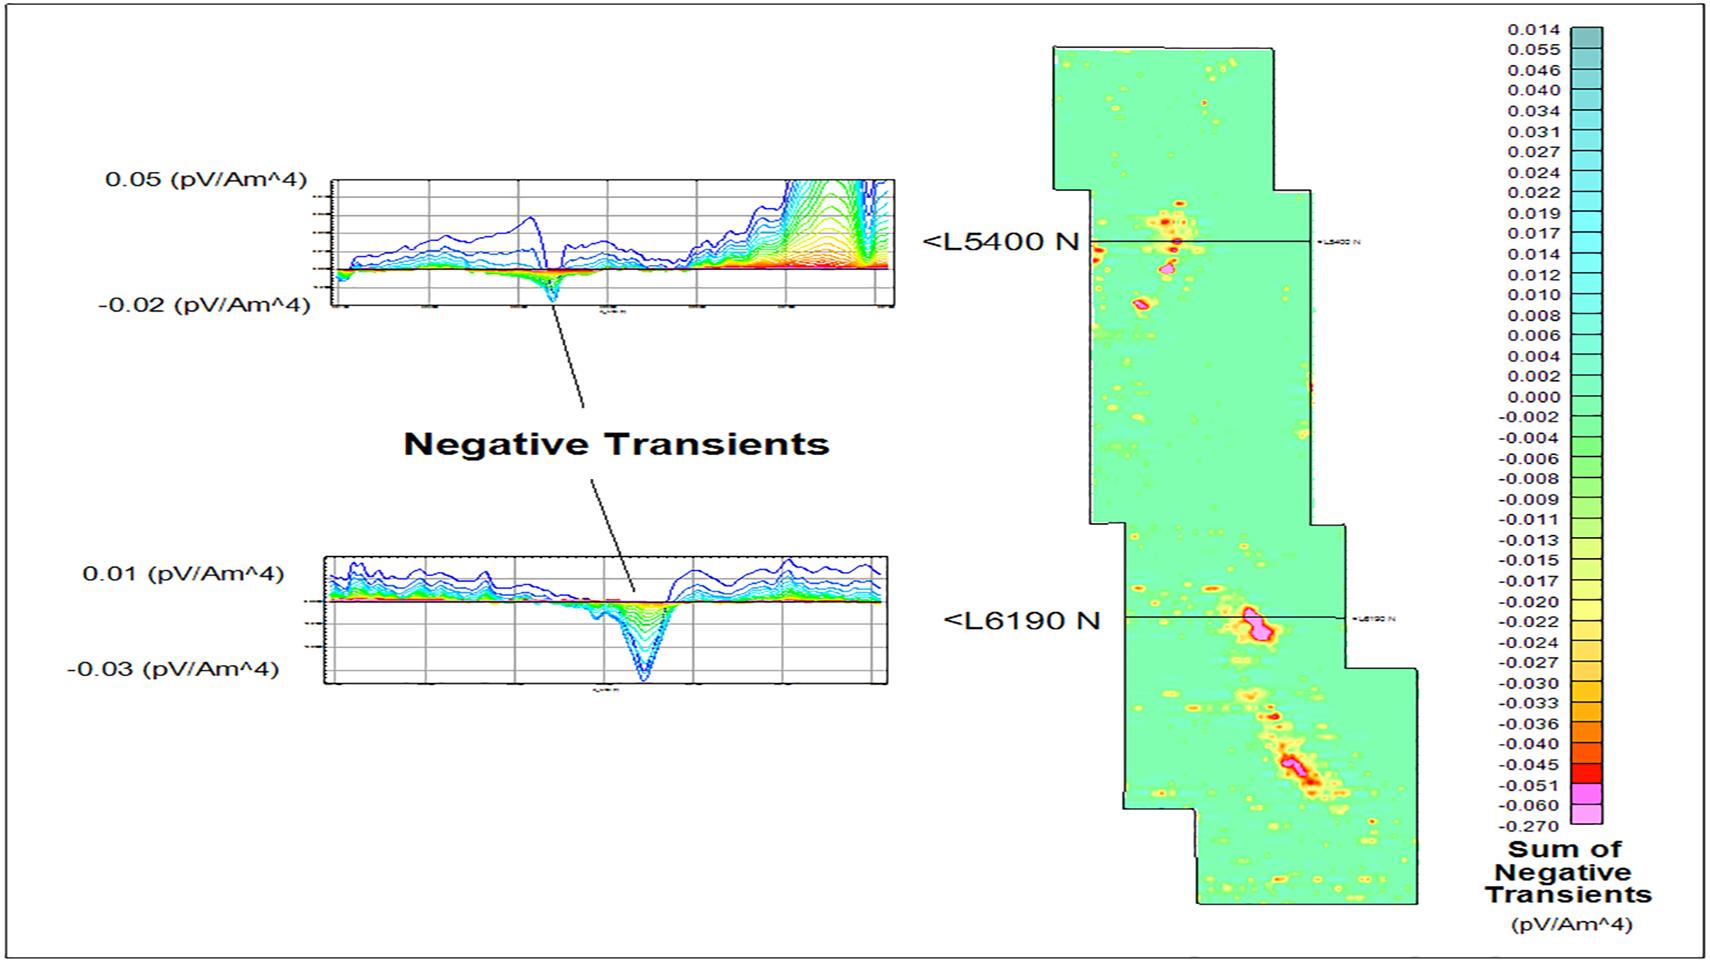 Figure 7: Sum of negative transients and two VTEM™ profiles, Tullah, Tasmania.